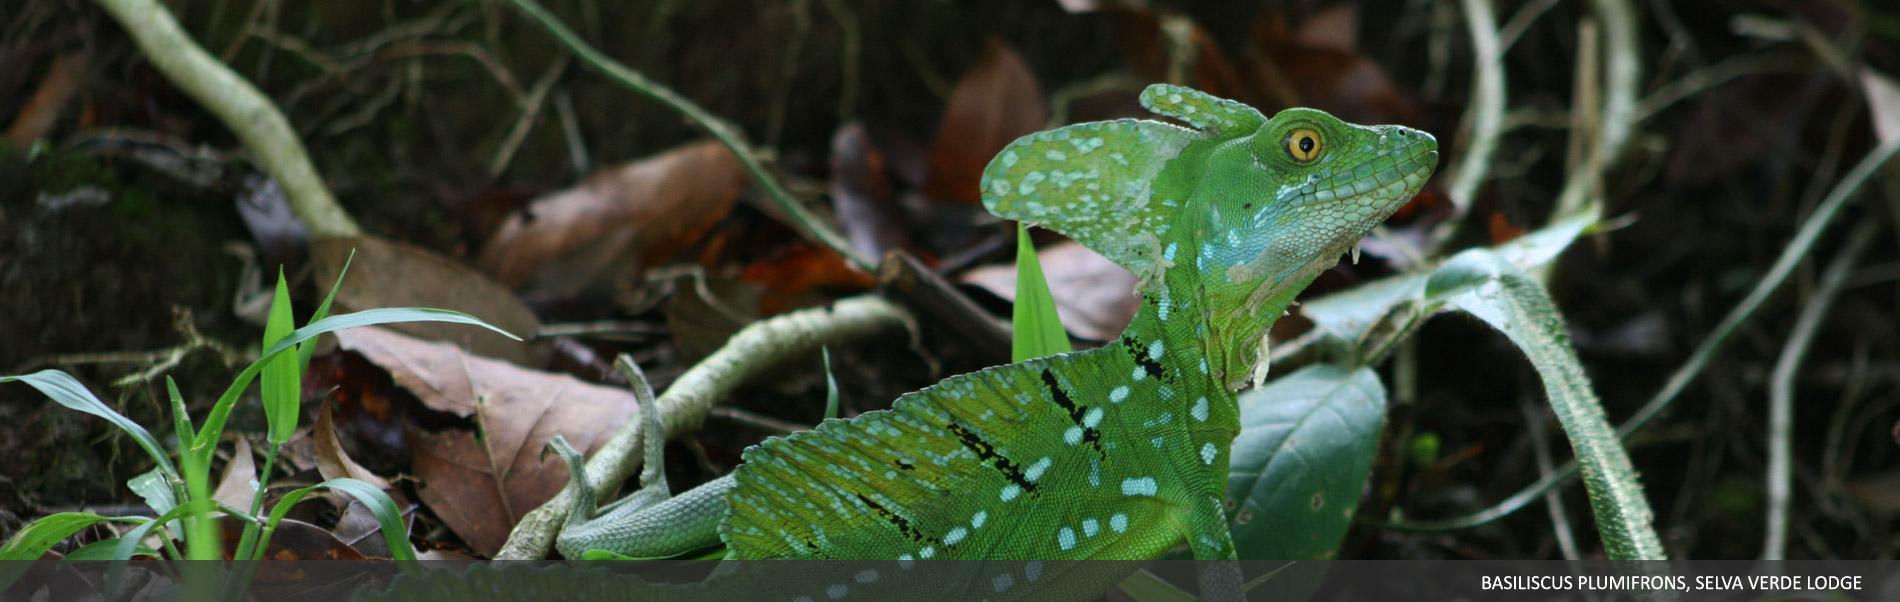 Amphibians-Reptiles-01.jpg